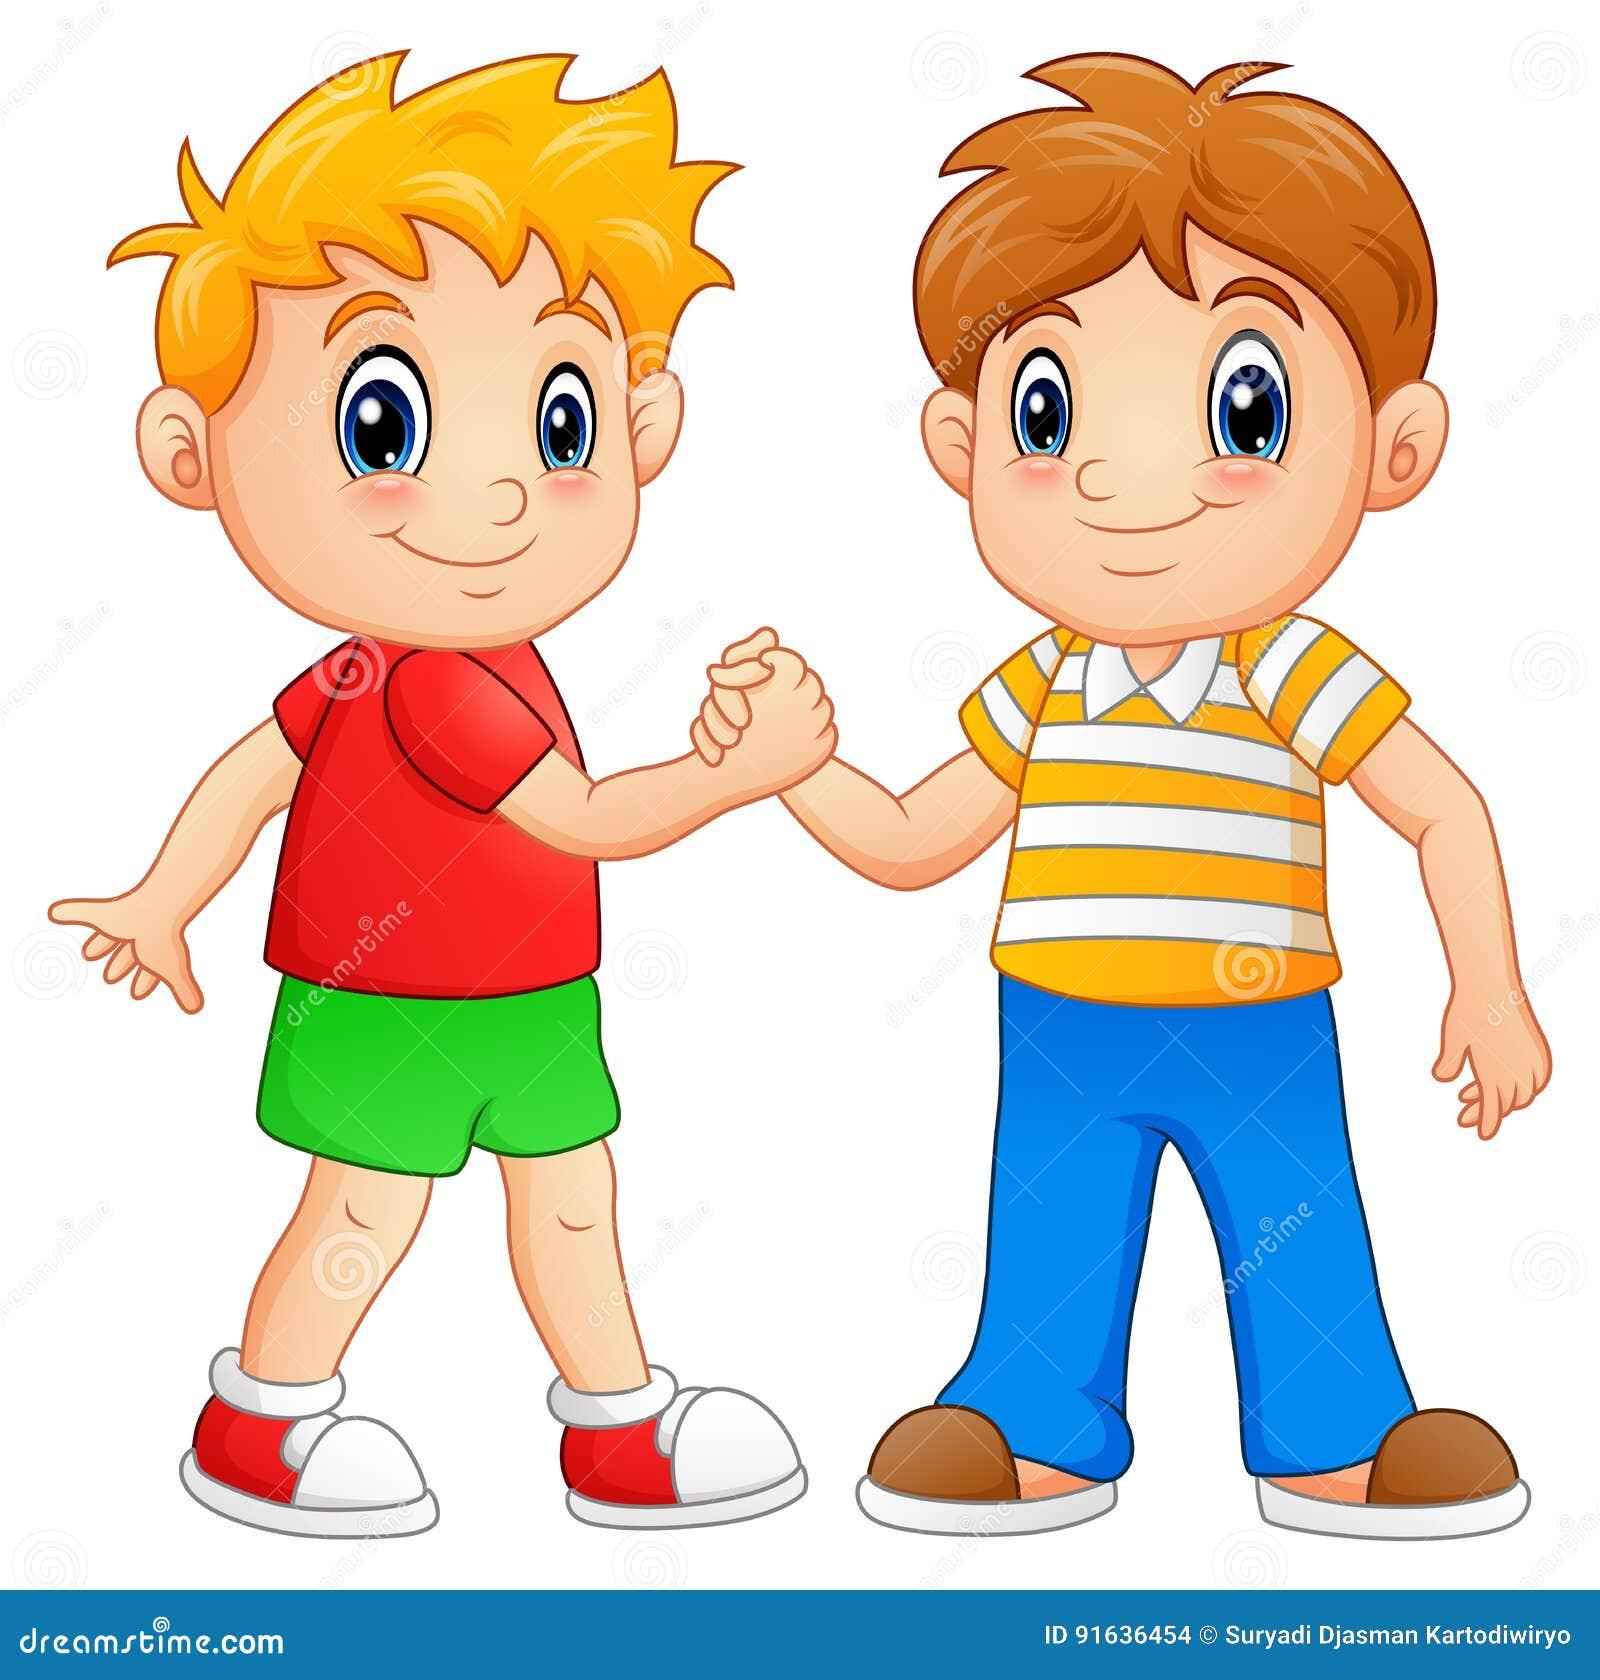 children handshake clipart - photo #37